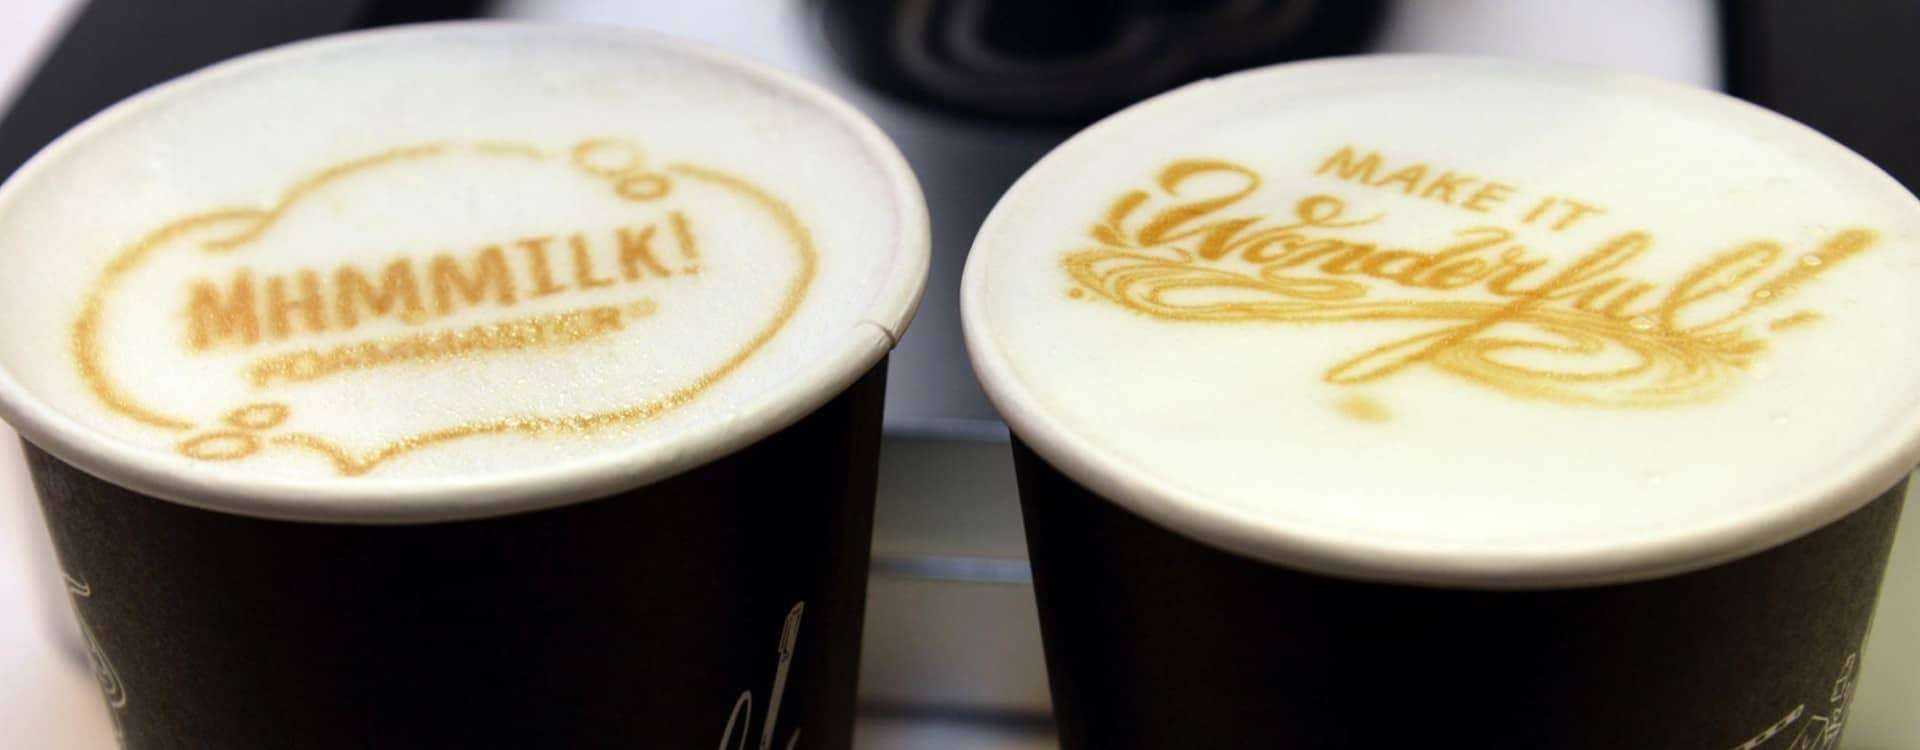 FRANKE_coffee-systems_make-it-wonderful-cups_ripple_latte-art_2000x781px.1482142118757